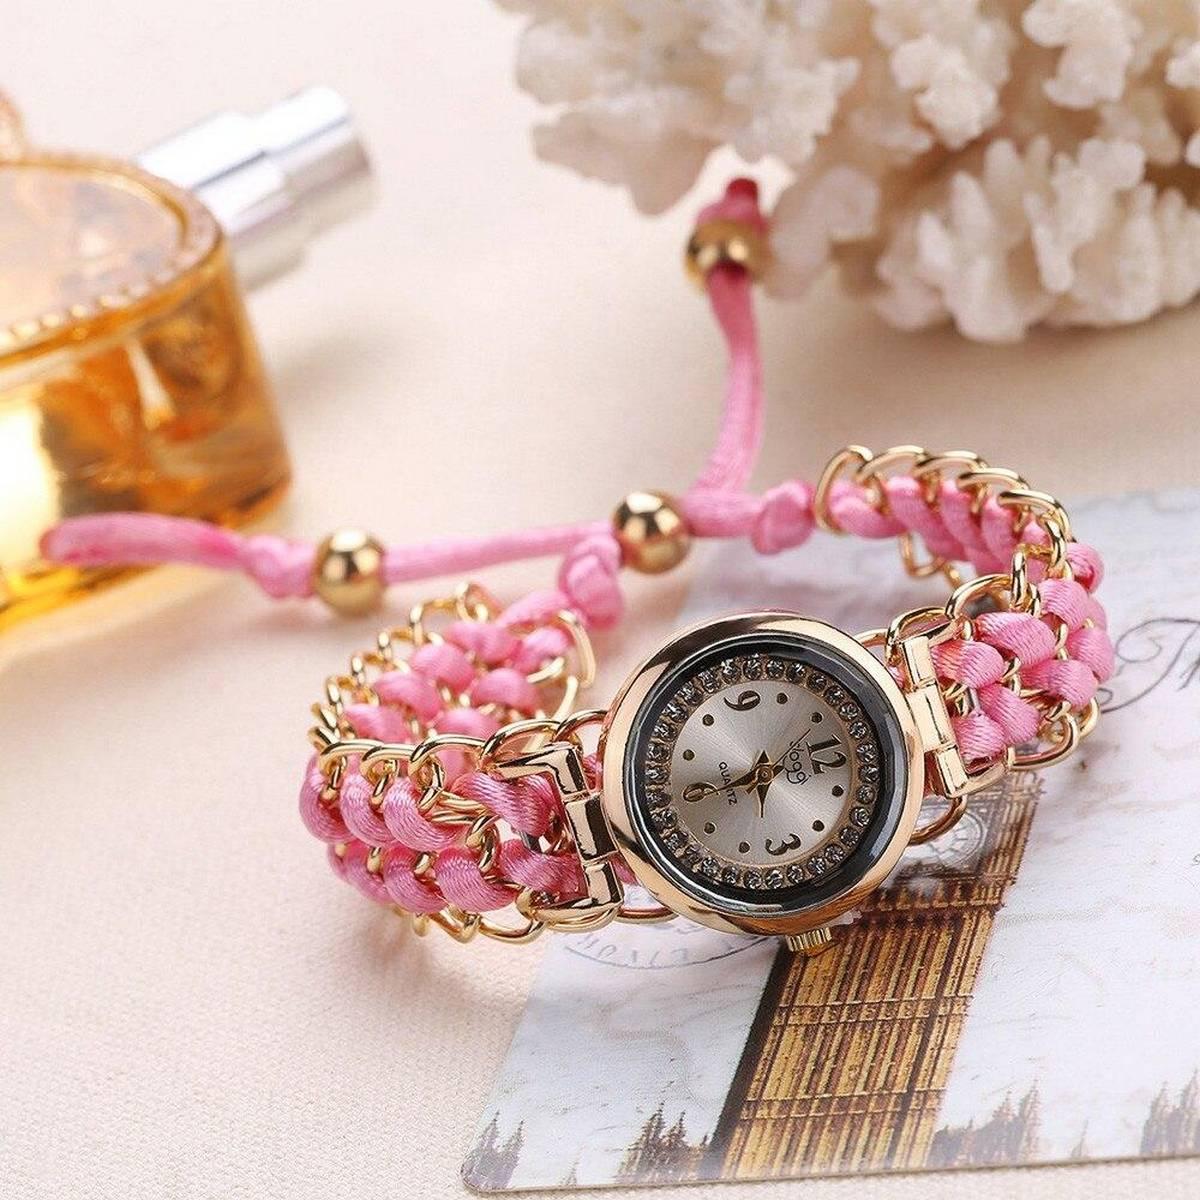 Handmade Paris Bracelet Watch For Wommen&girls